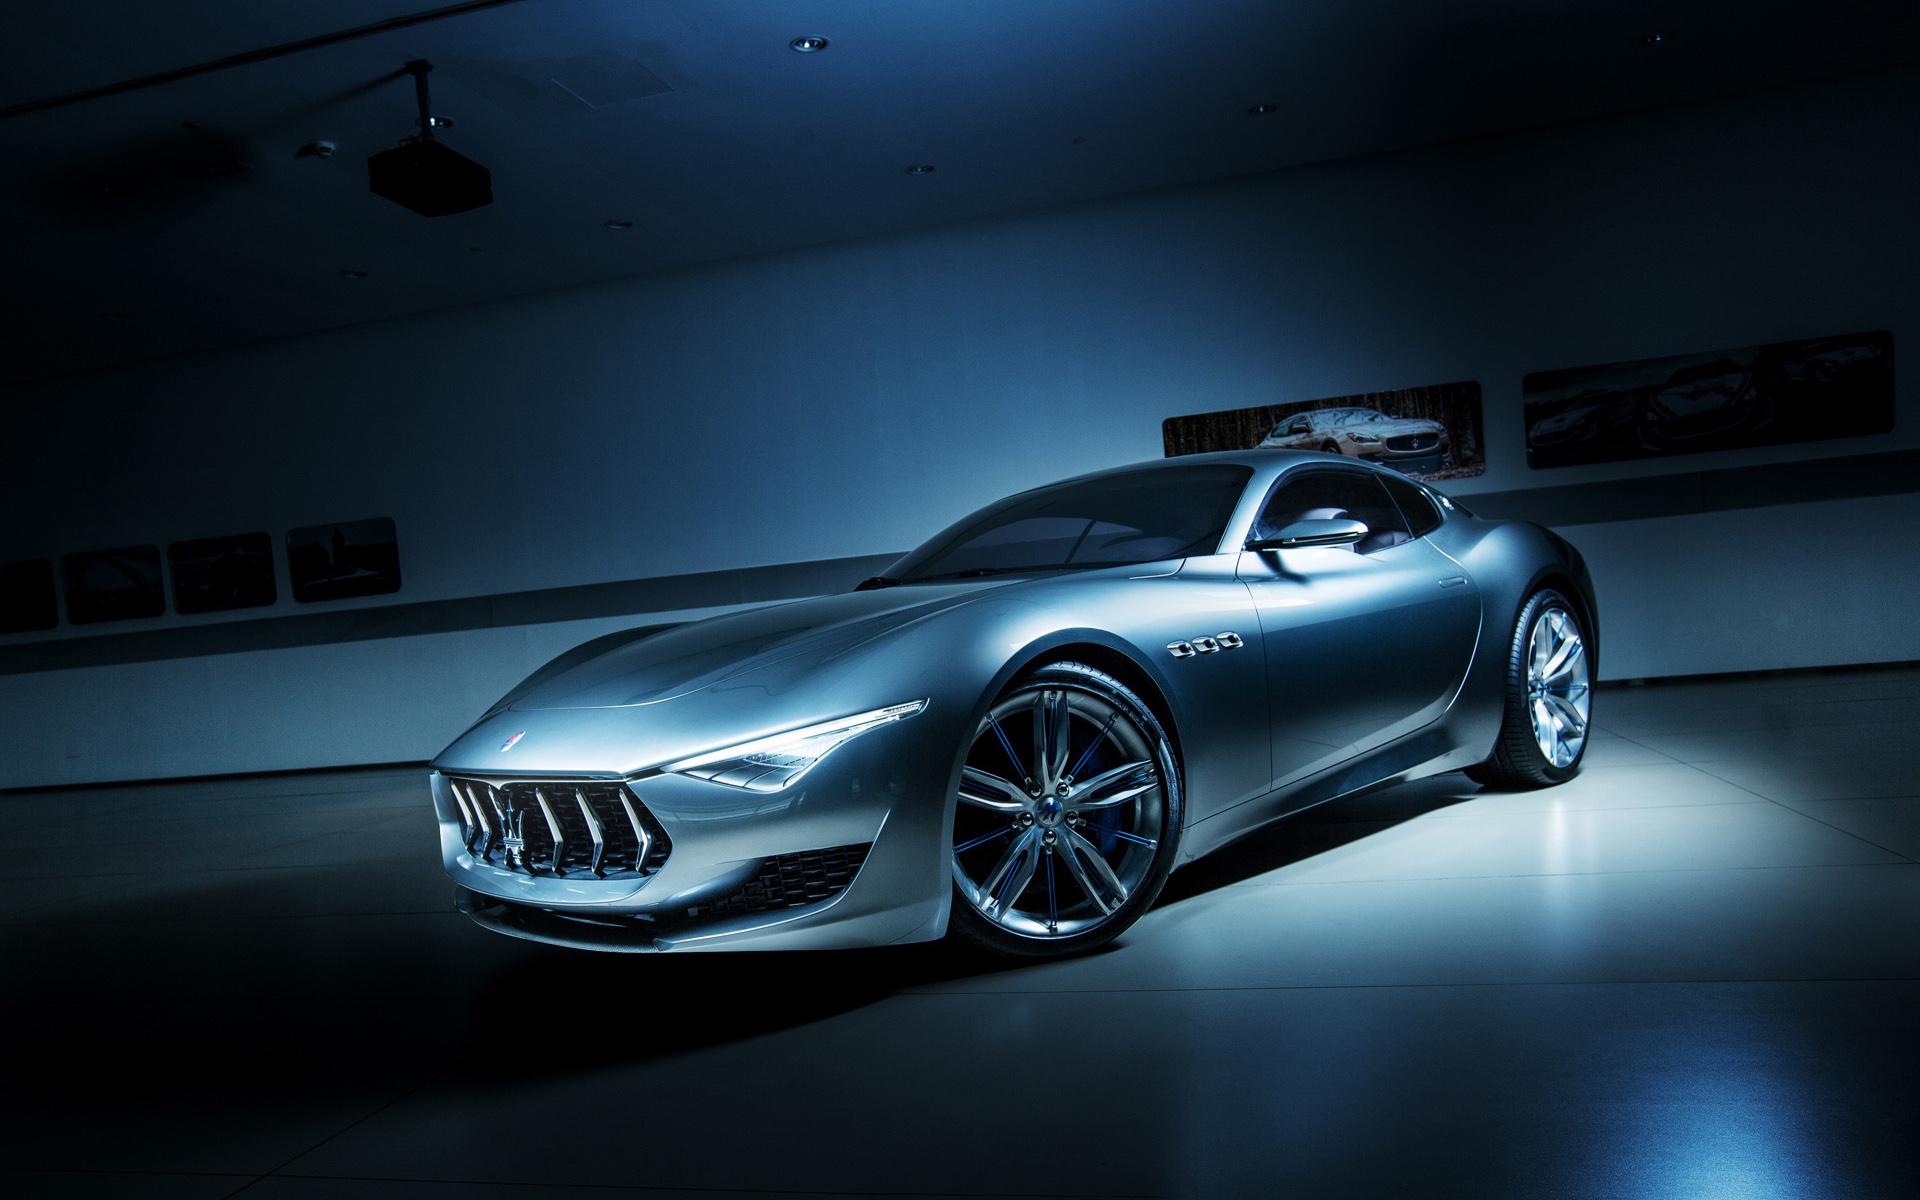 Maserati Alfieri 2016 Wallpaper Hd Car Wallpapers Id 6014